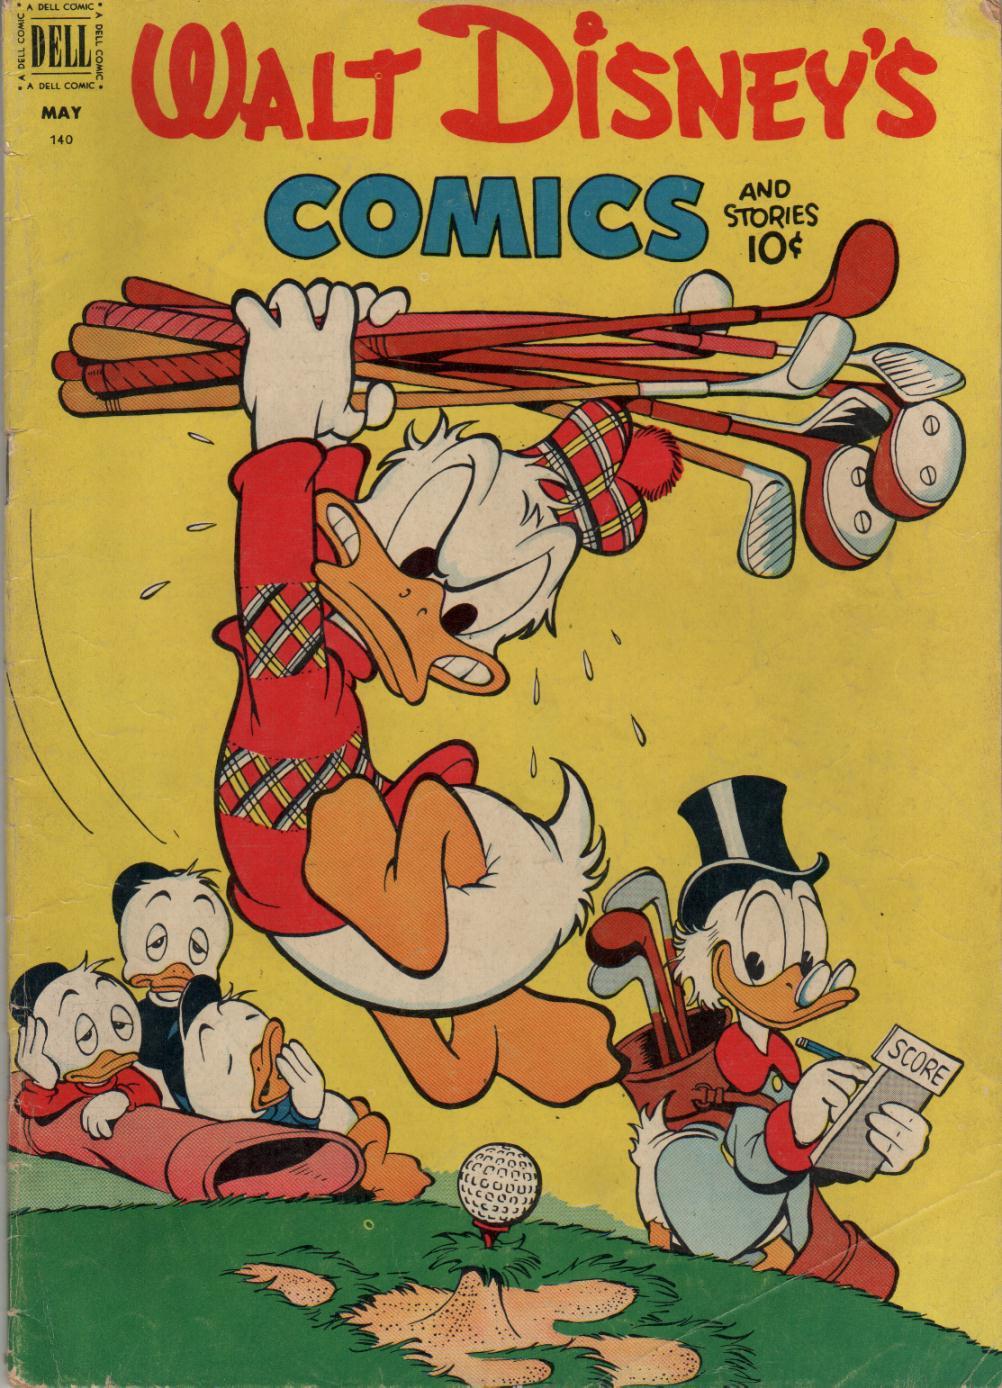 Walt Disneys Comics and Stories 140 Page 1